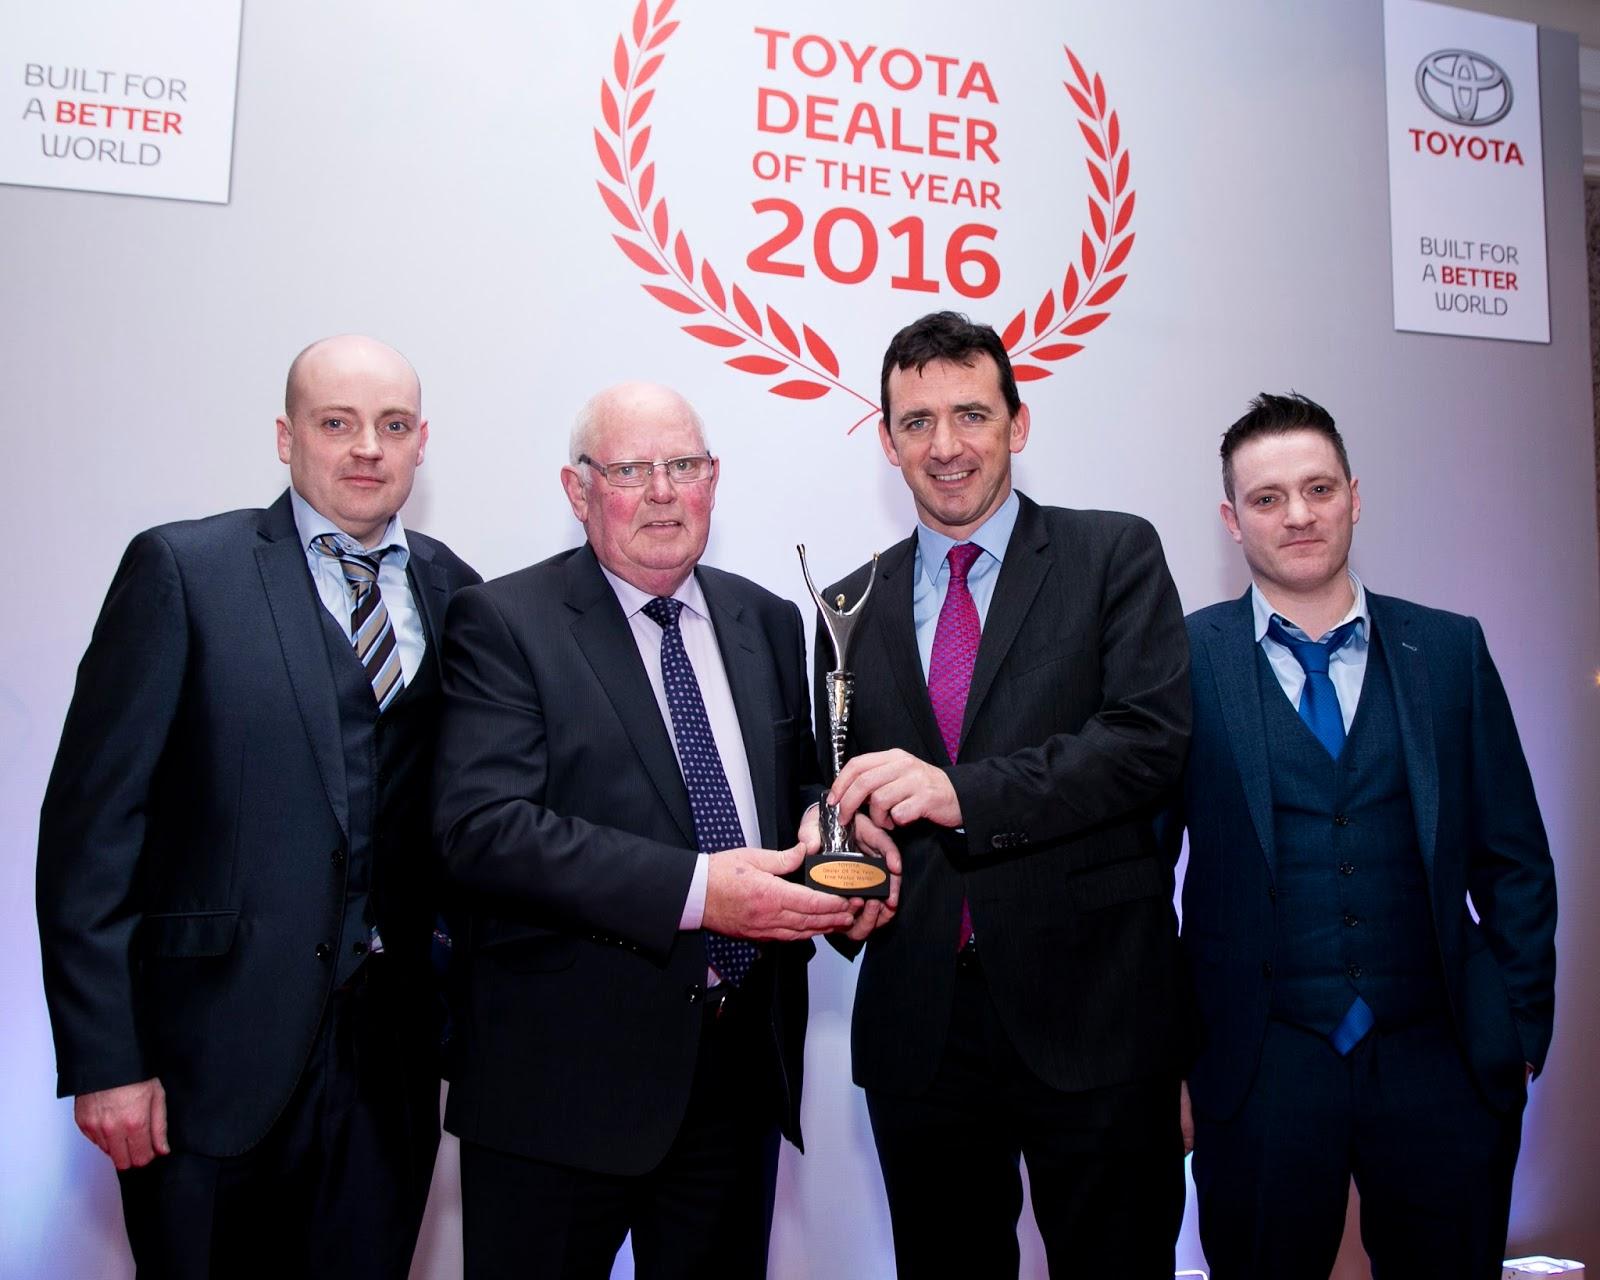 D Byrne Car Sales Wexford